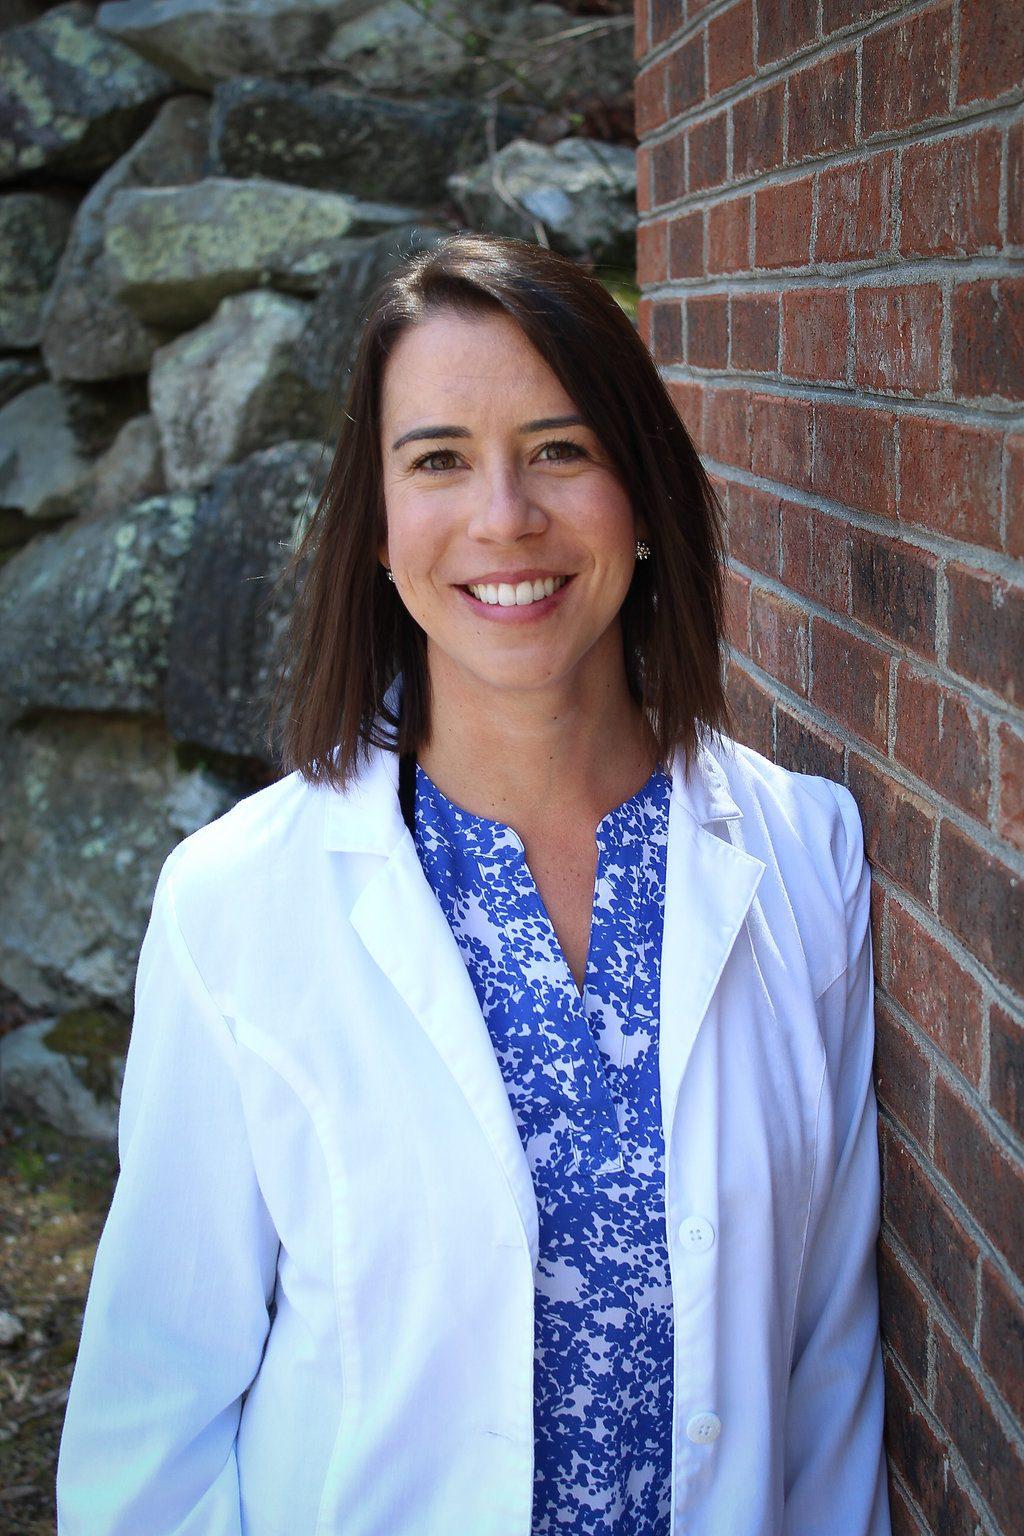 Dr. Jessica O. Planer, DDS